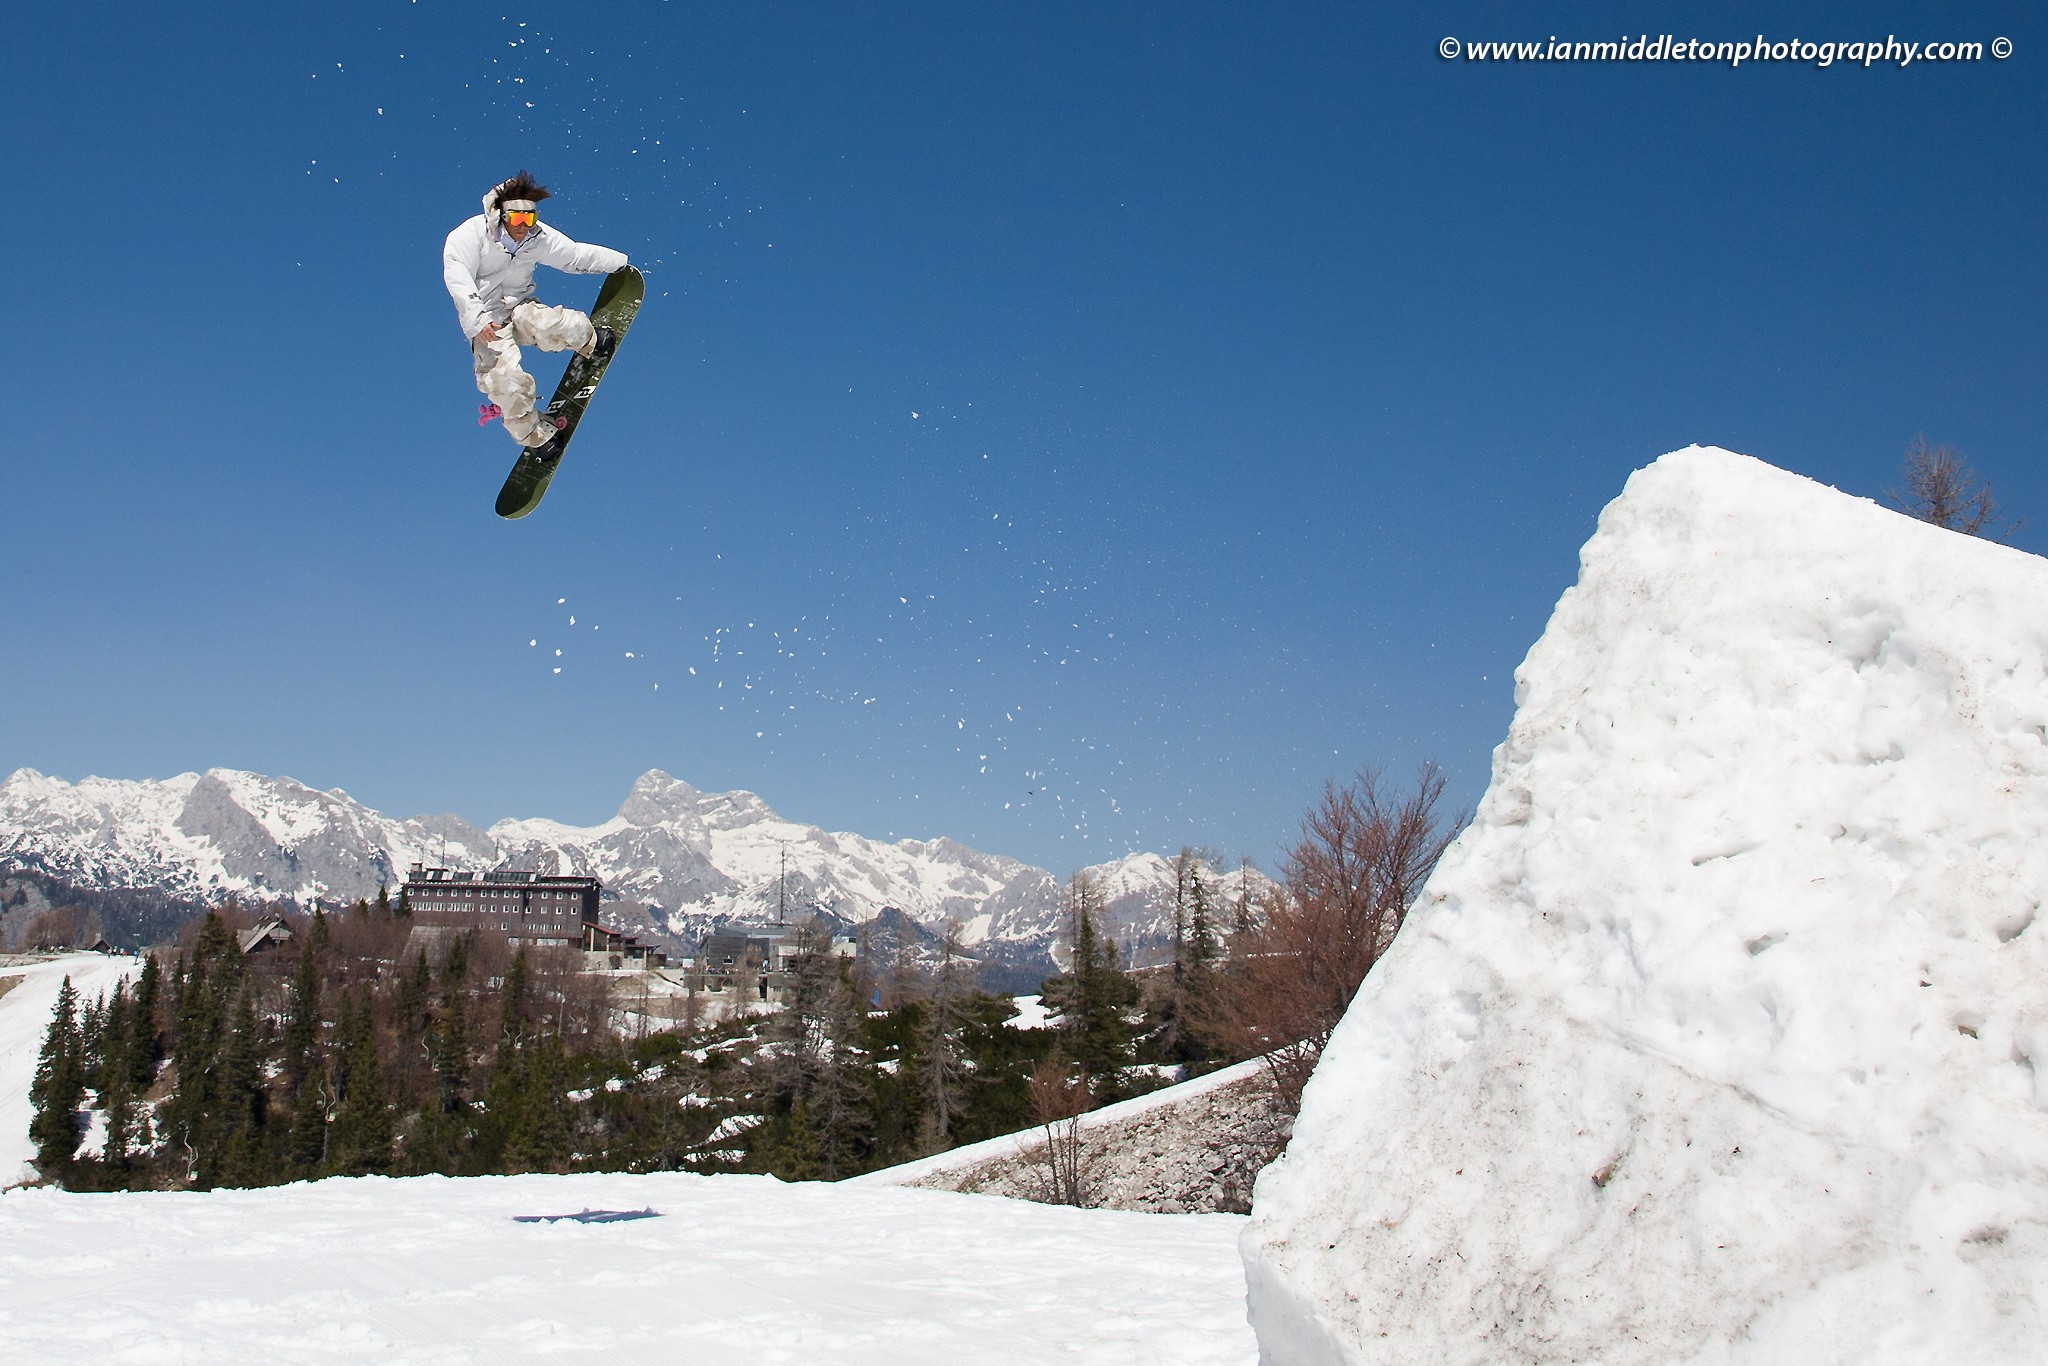 Snowboard jumper at Vogel Mountain, Slovenia